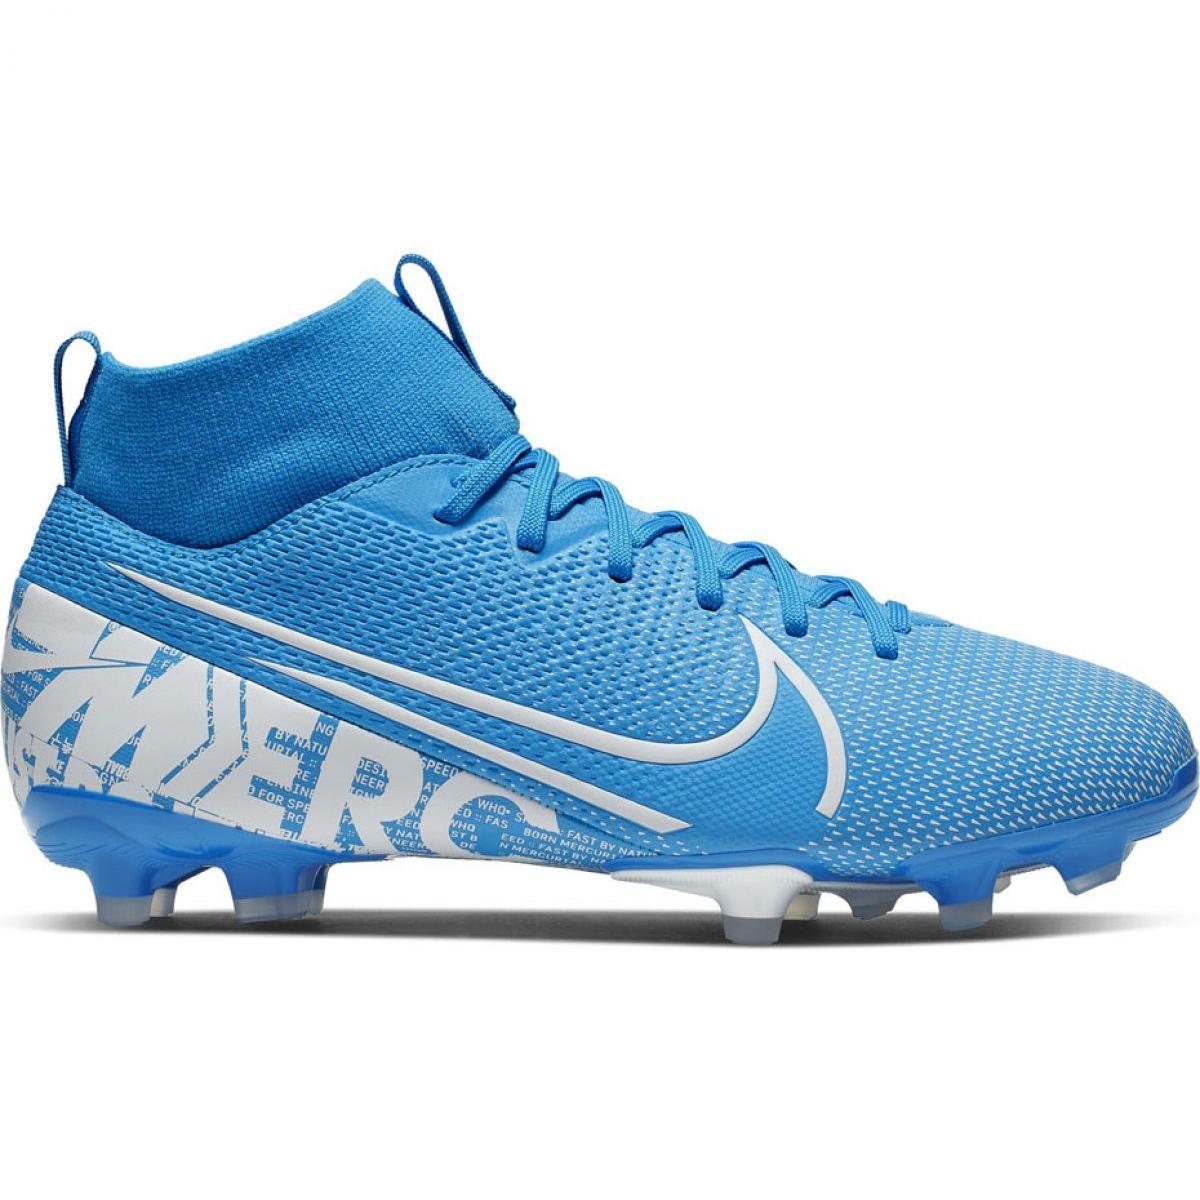 Détails sur Chaussures de foot Nike Mercurial Superfly 7 Academy FG MG Jr AT8120 414 bleu